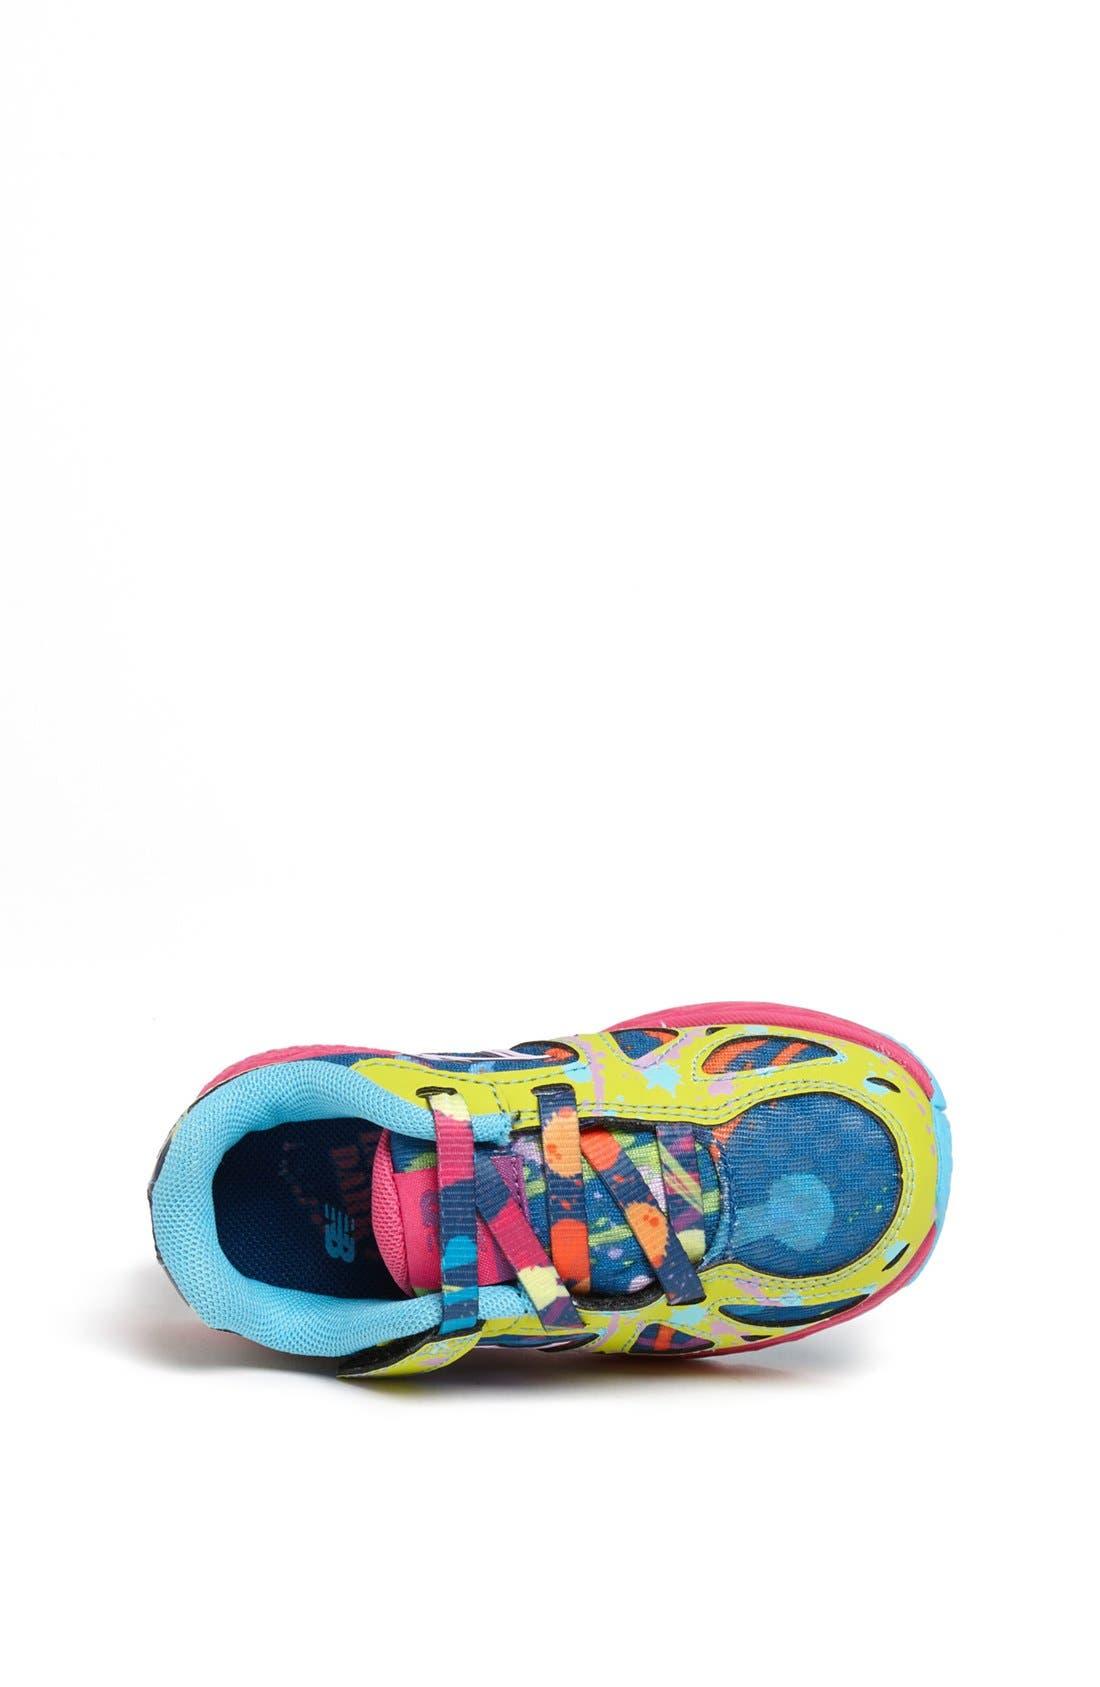 Alternate Image 3  - New Balance '890 Alpha' Sneaker (Baby, Walker & Toddler)